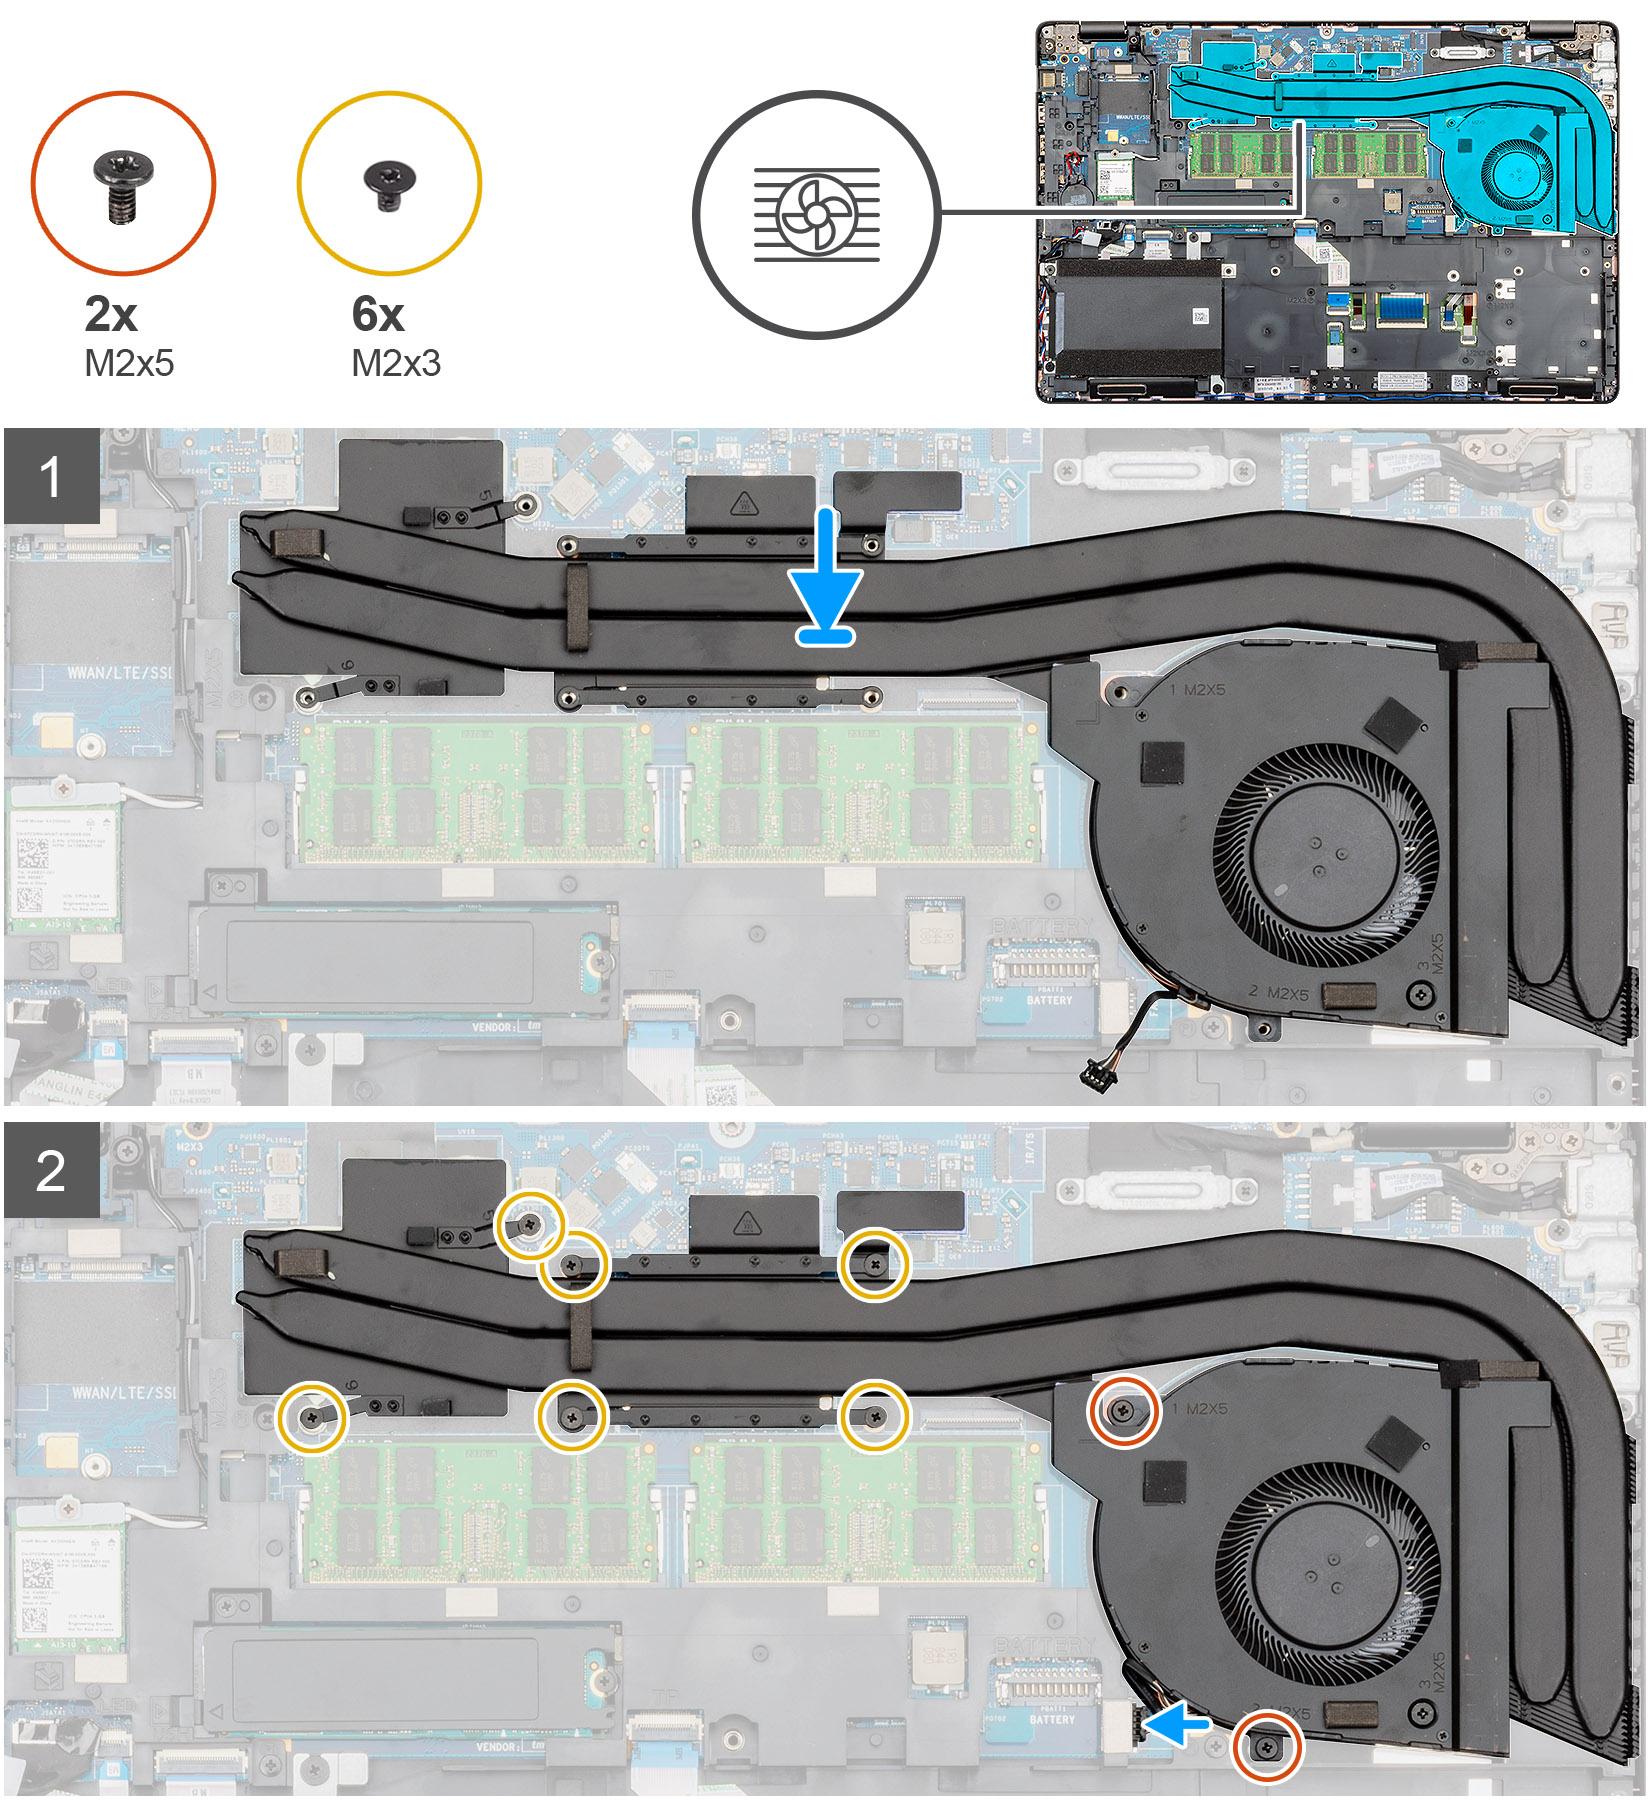 Installing the Heatsink-discrete